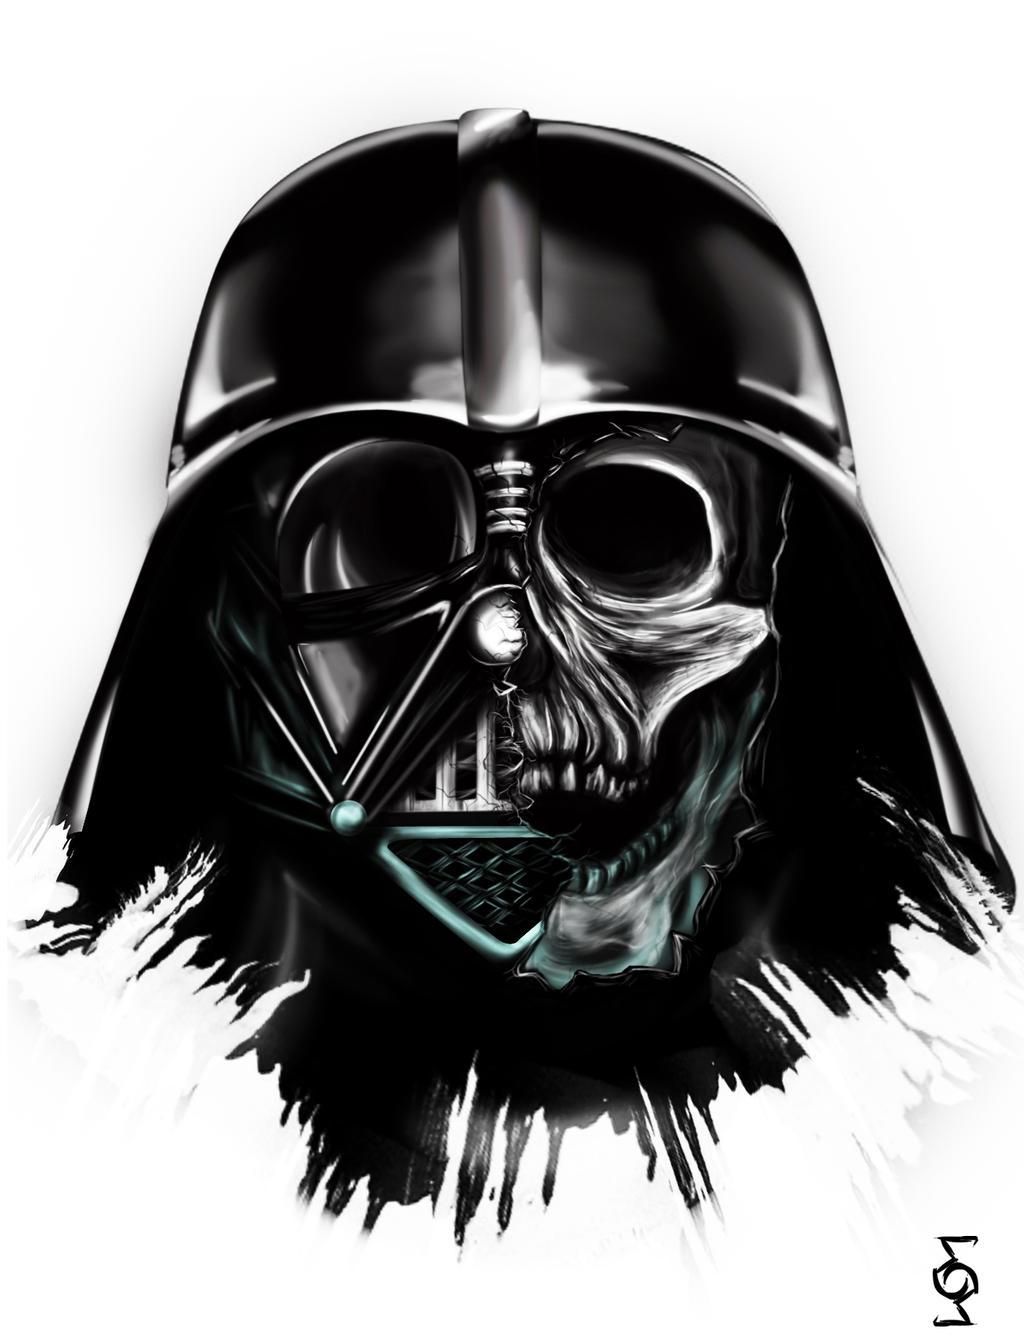 Behind the Mask- Darth Vader by EG-TheFreak on DeviantArt